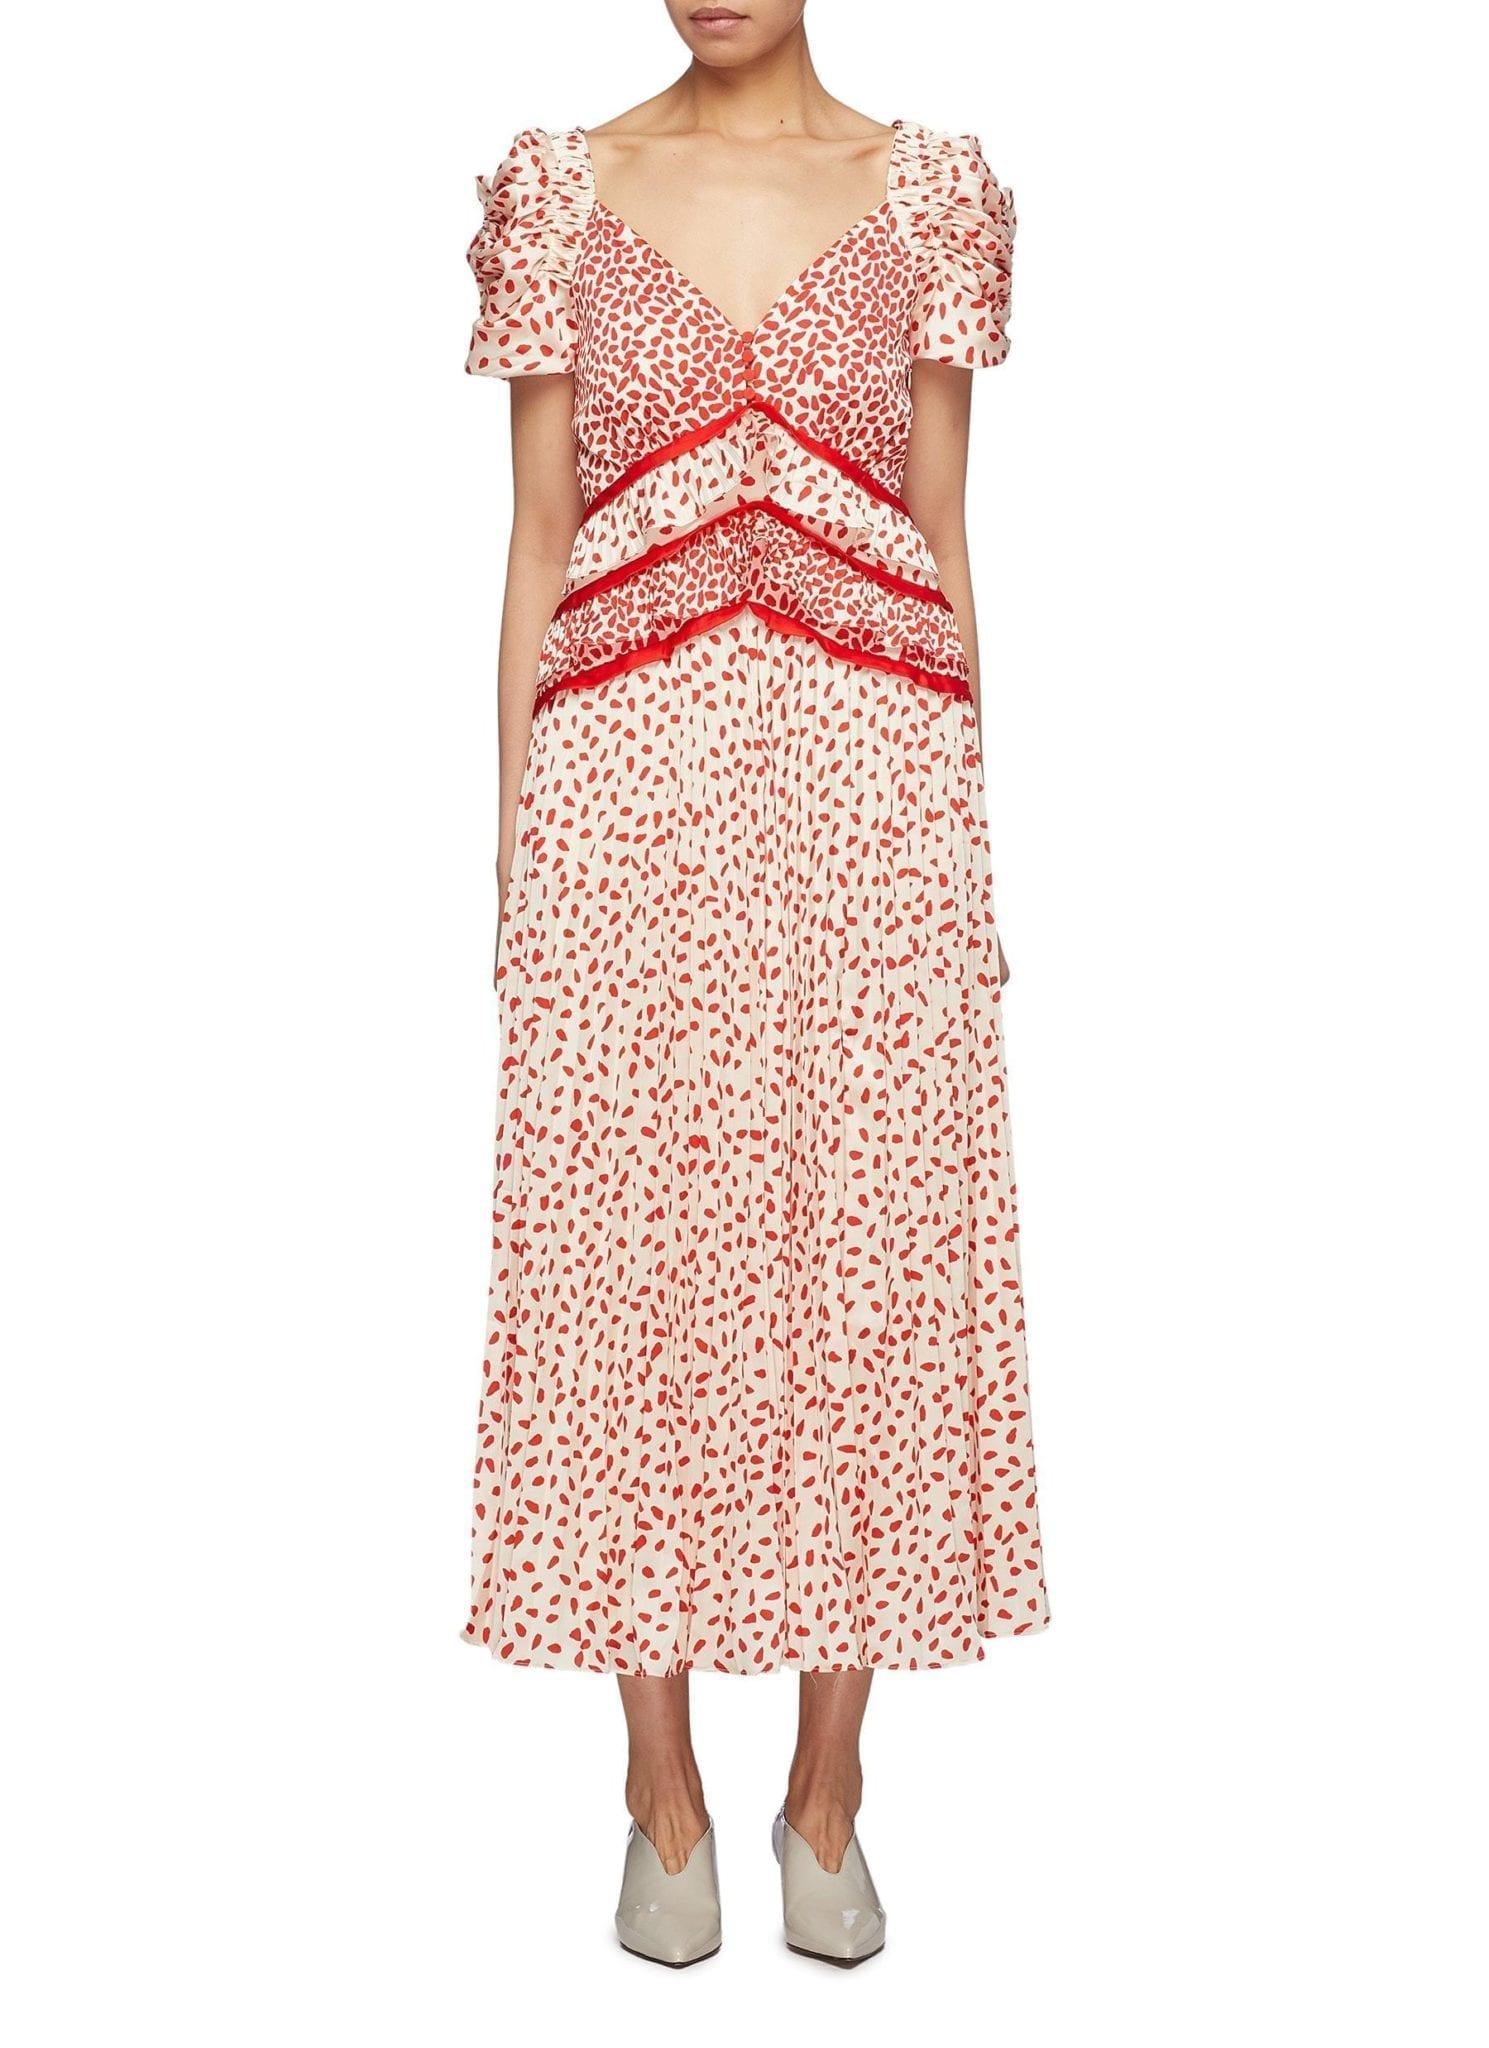 SELF-PORTRAIT Puff Sleeve Ruffle Waist Graphic Print Satin Cream Dress